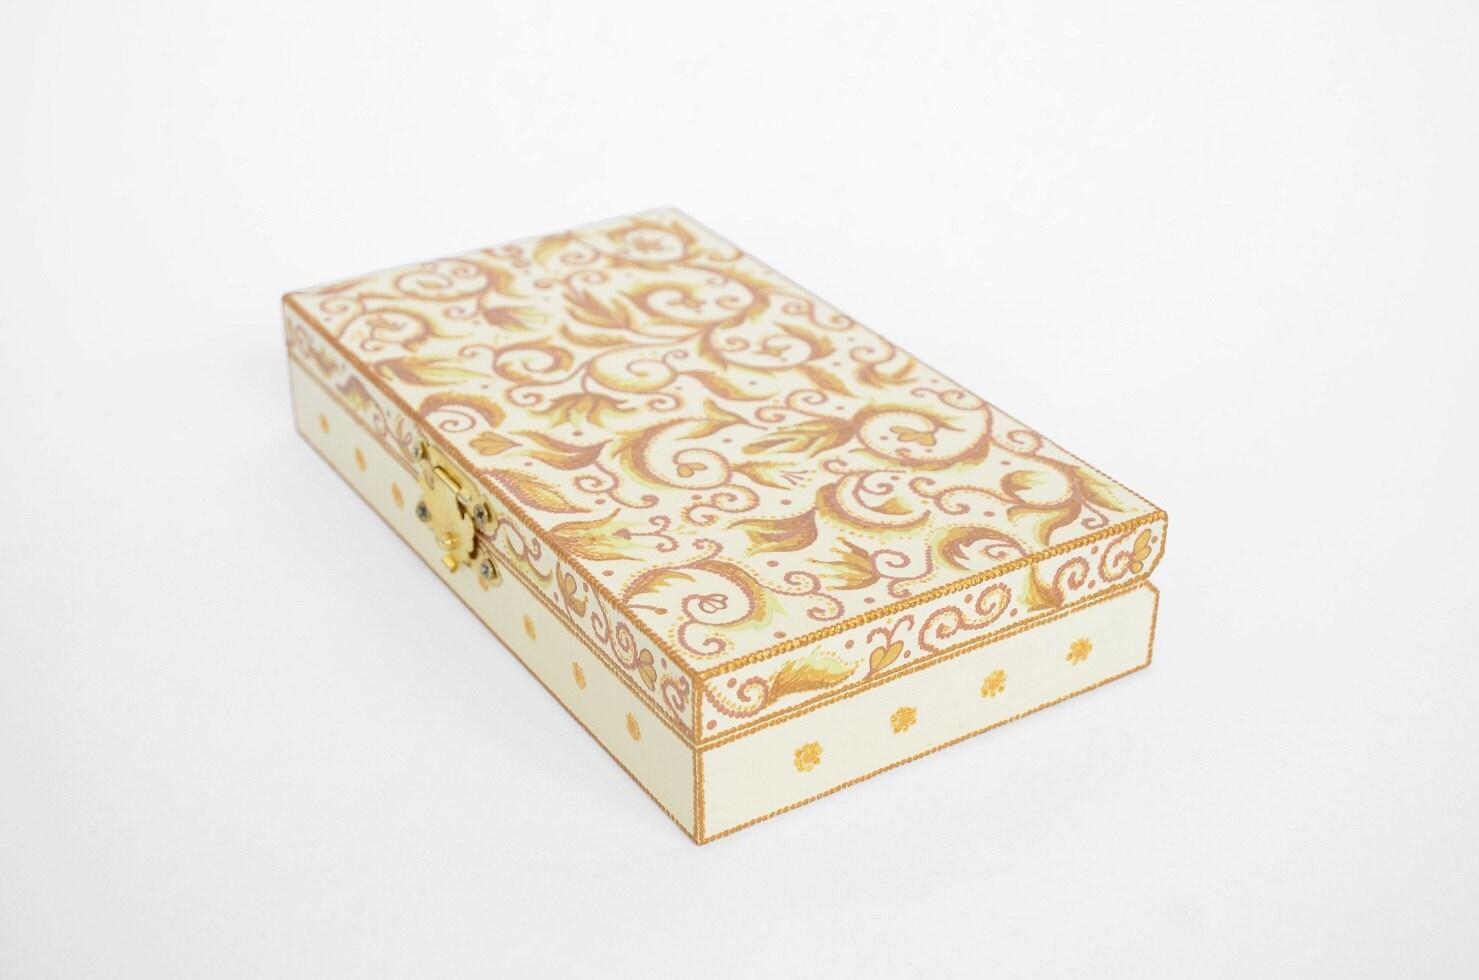 Decorative Jewelry Boxes Ideas : Sale hand painted jewelry box cash flat